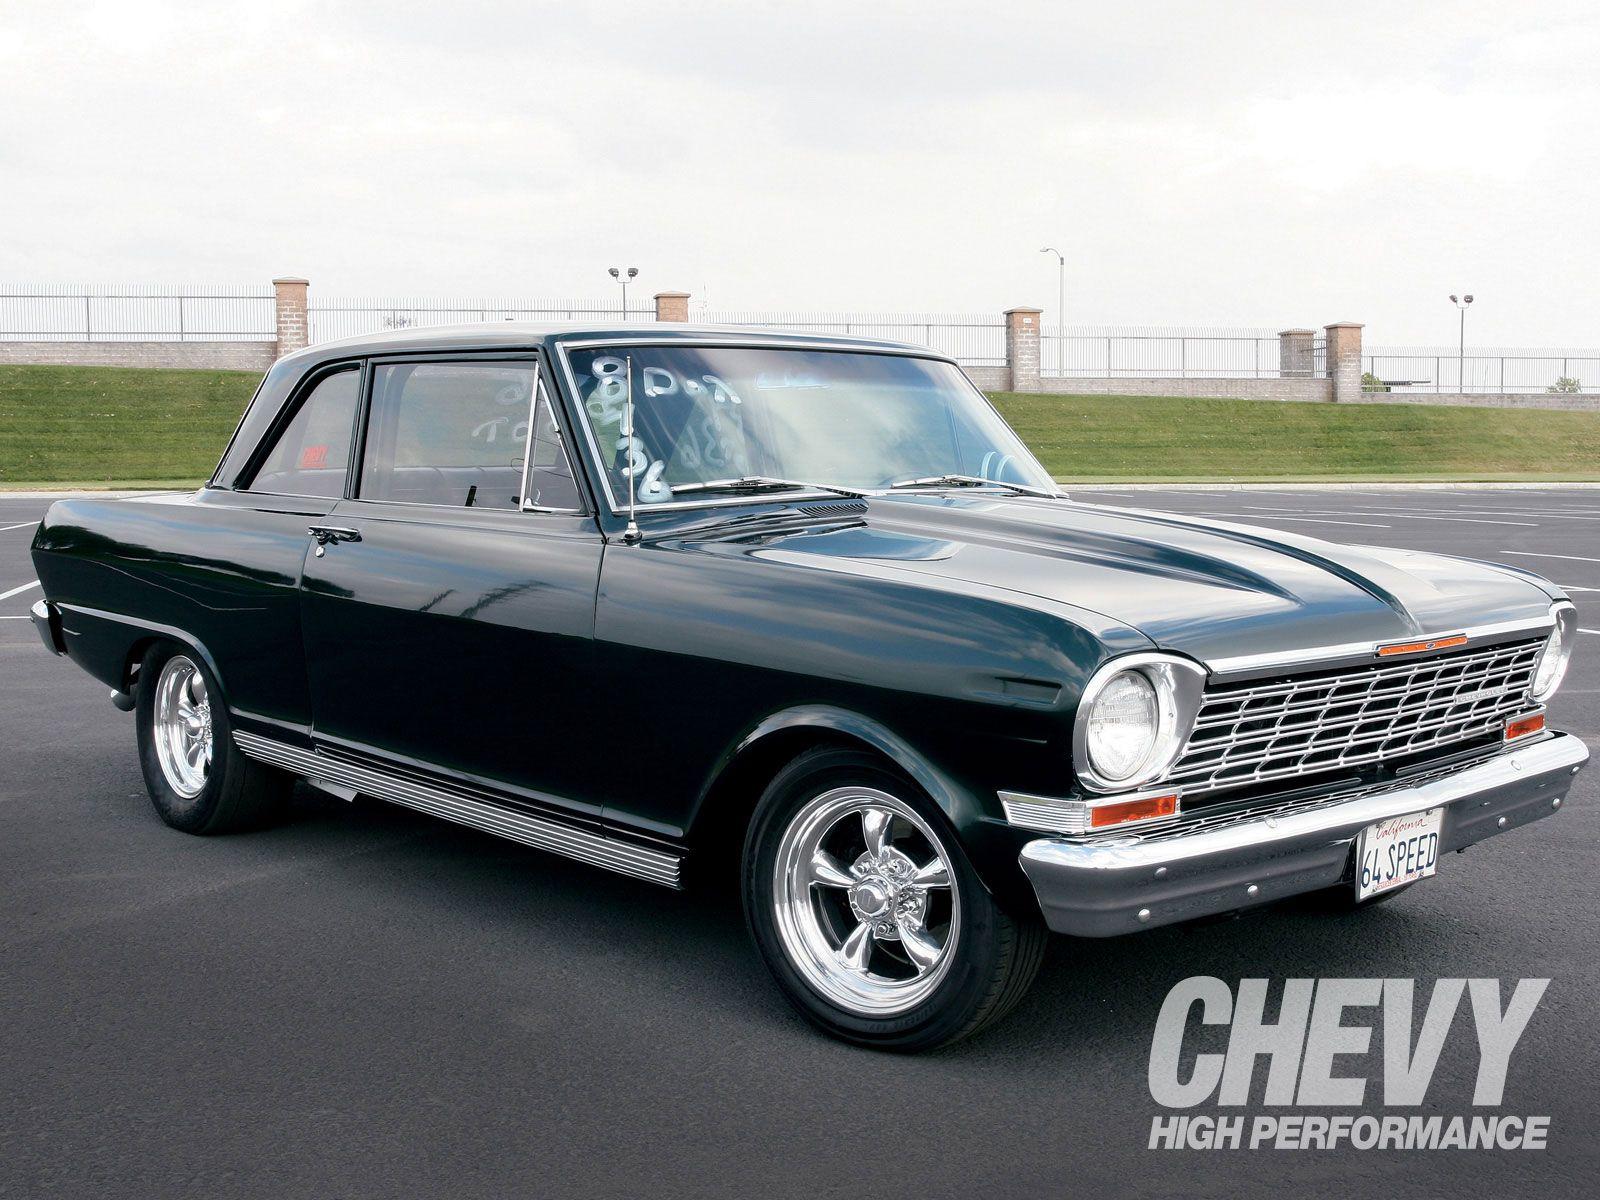 1964 Chevy ll aka Nova   Gen 1st 62636465 Chevy ll